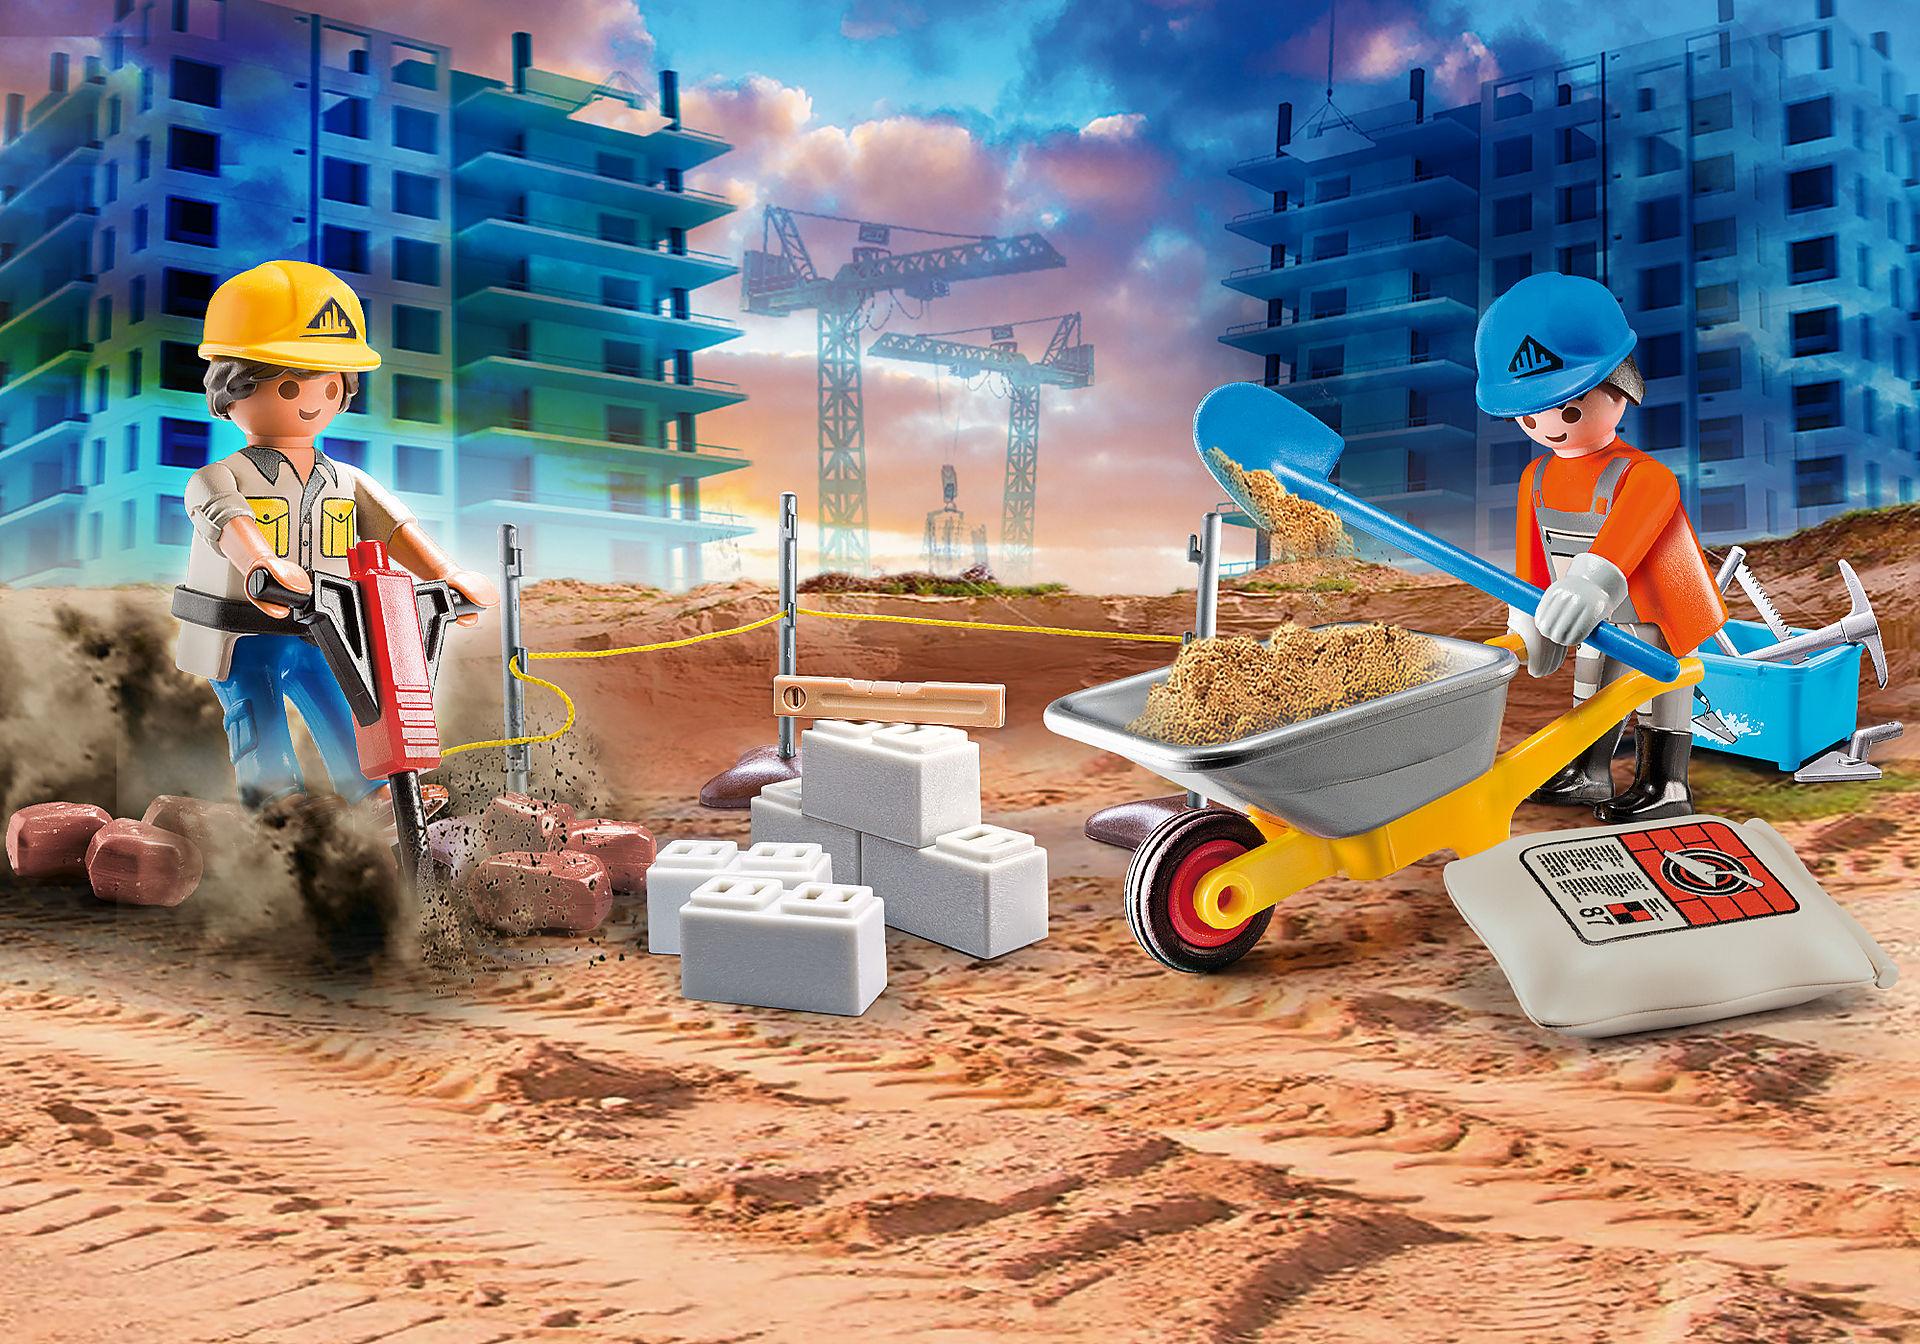 70528 Construction Site Carry Case zoom image1